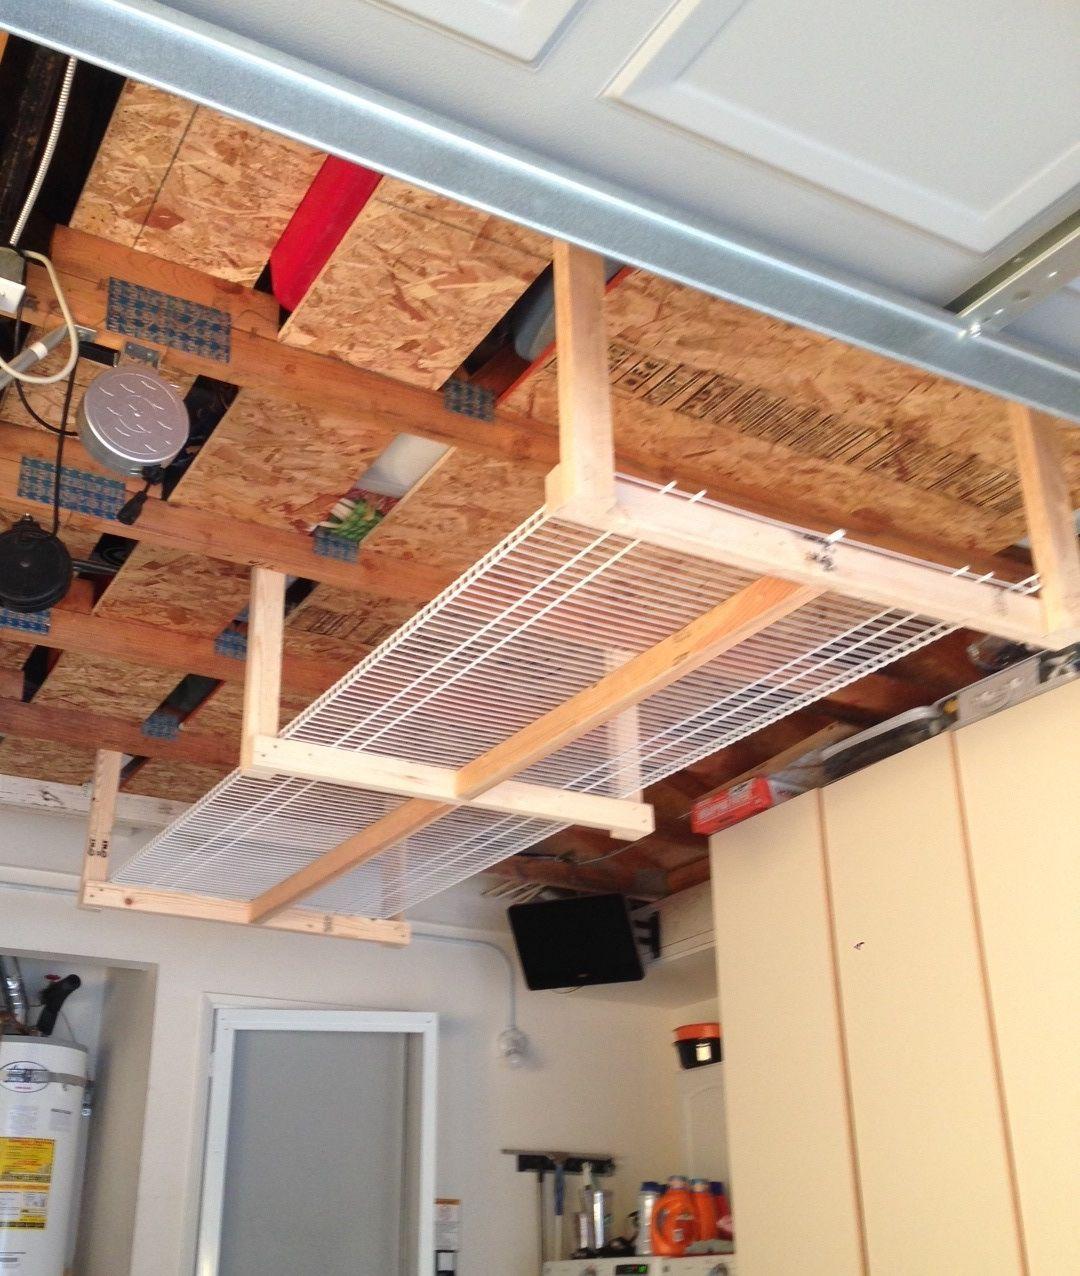 Diy overhead garage storage rackfour 2x3s and two 8